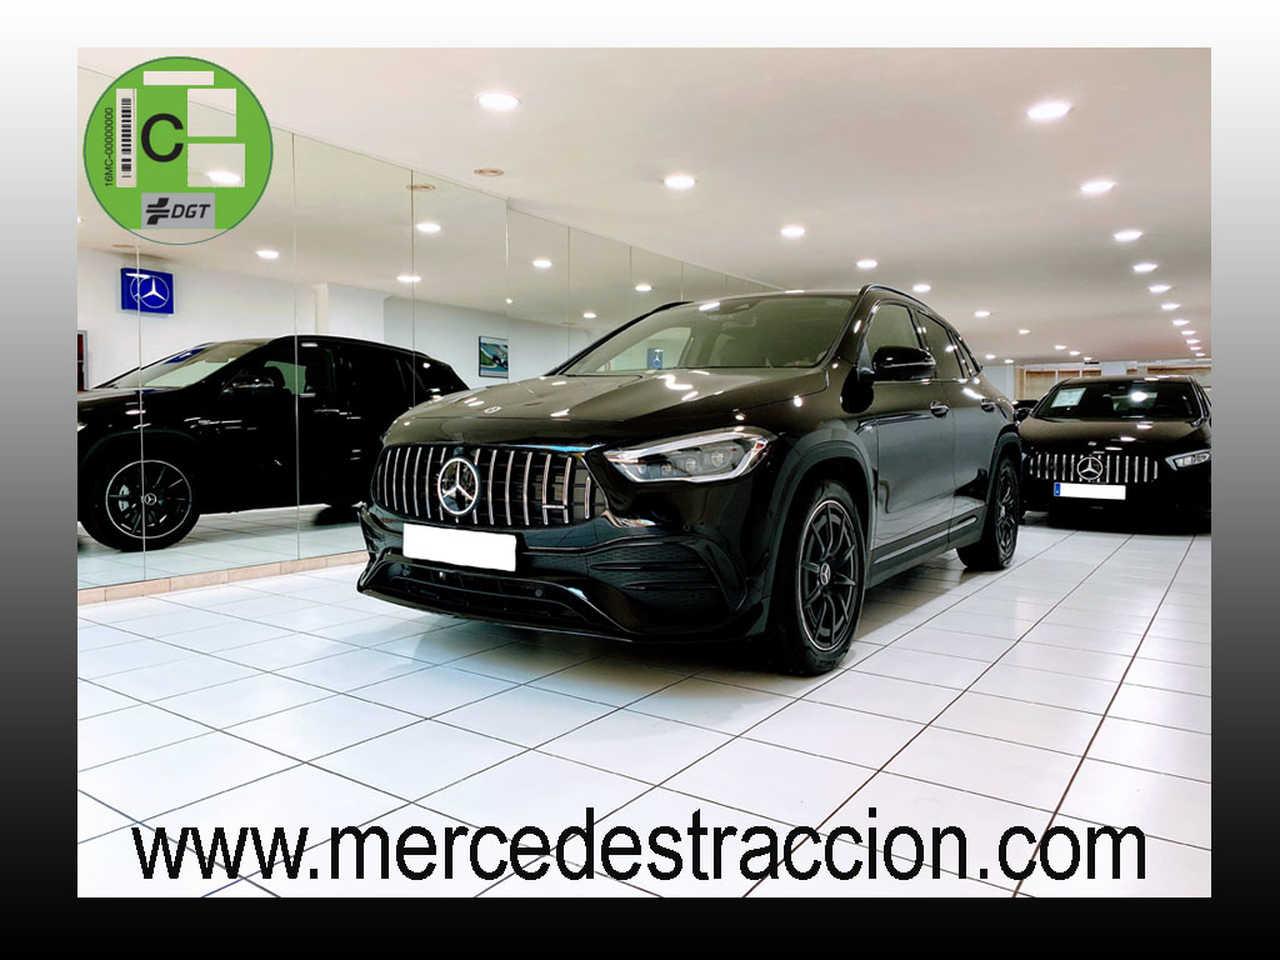 Mercedes GLA 35 AMG 4 Matic/AMG Line/8 G/Navegación/Parktronic/Km 0   - Foto 1